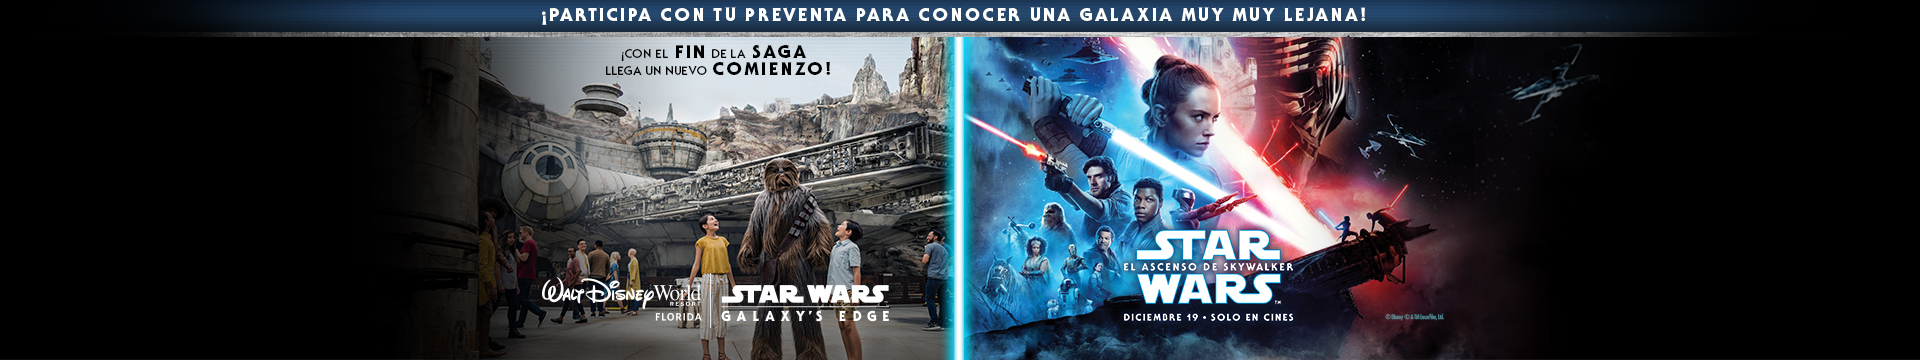 Preventa Star Wars El Ascenso de Skywalker